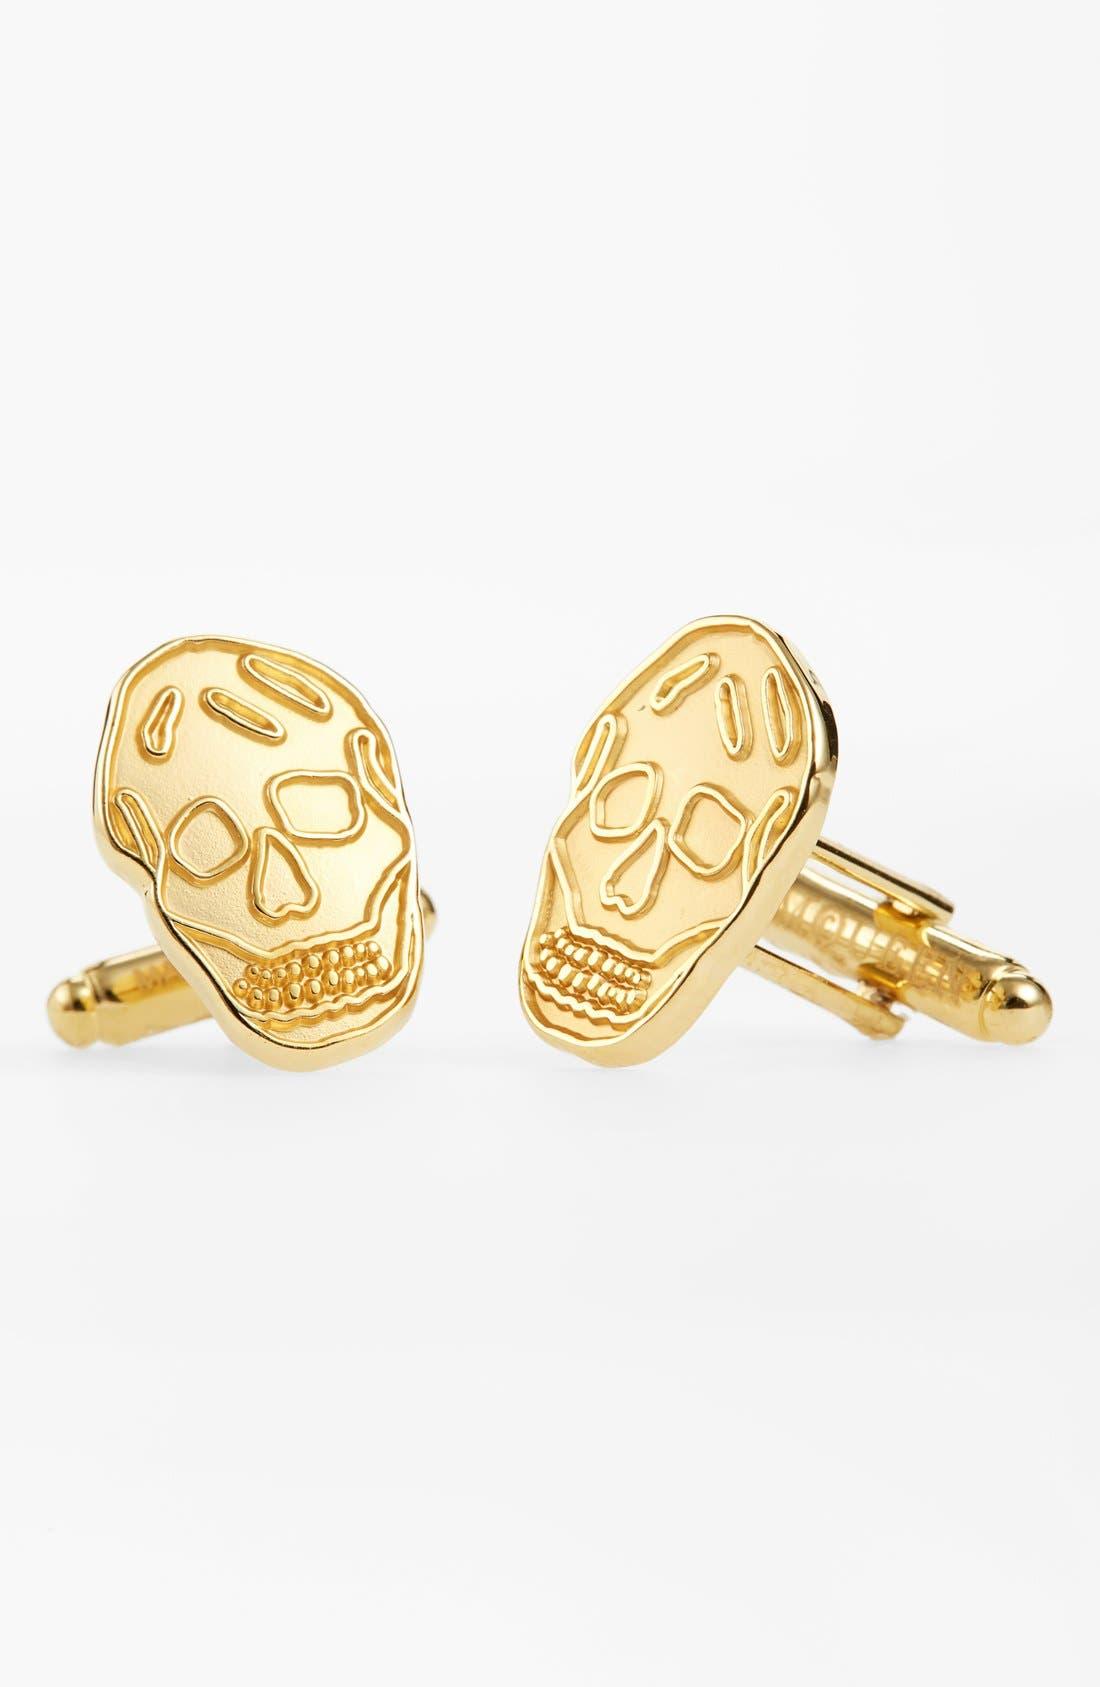 Brass Skull Cuff Links,                         Main,                         color, Gold